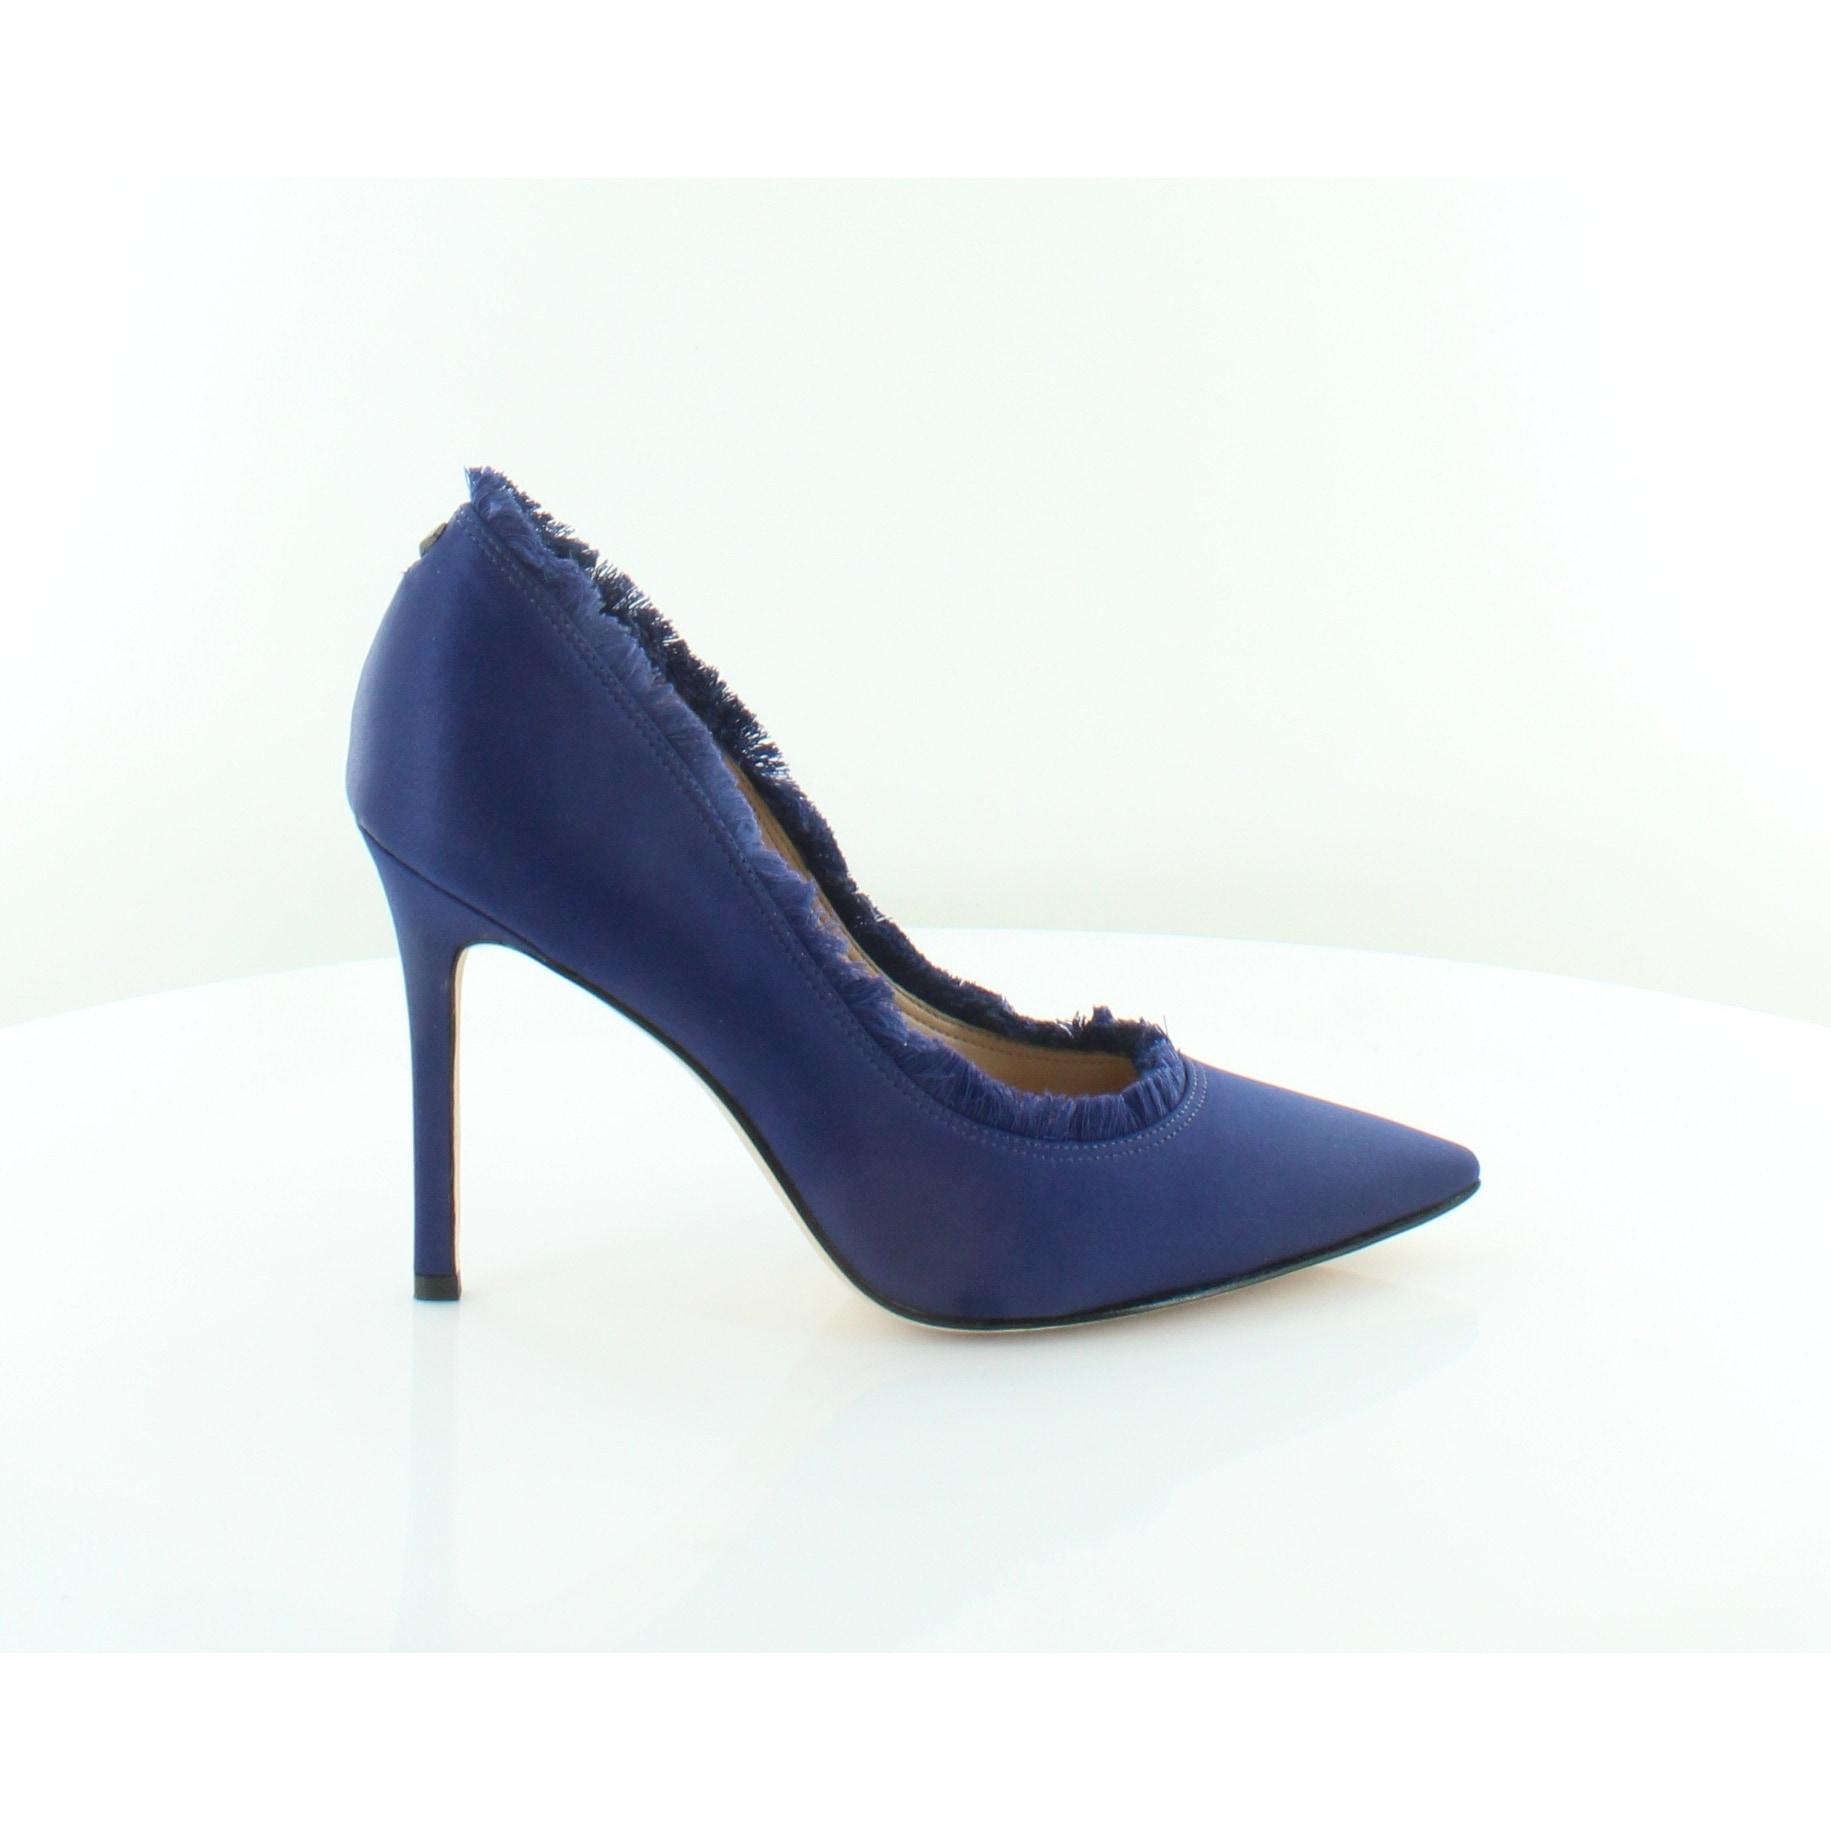 2639c7869 Shop Sam Edelman Halan Women s Heels Navy - 7.5 - Free Shipping Today -  Overstock - 26641343